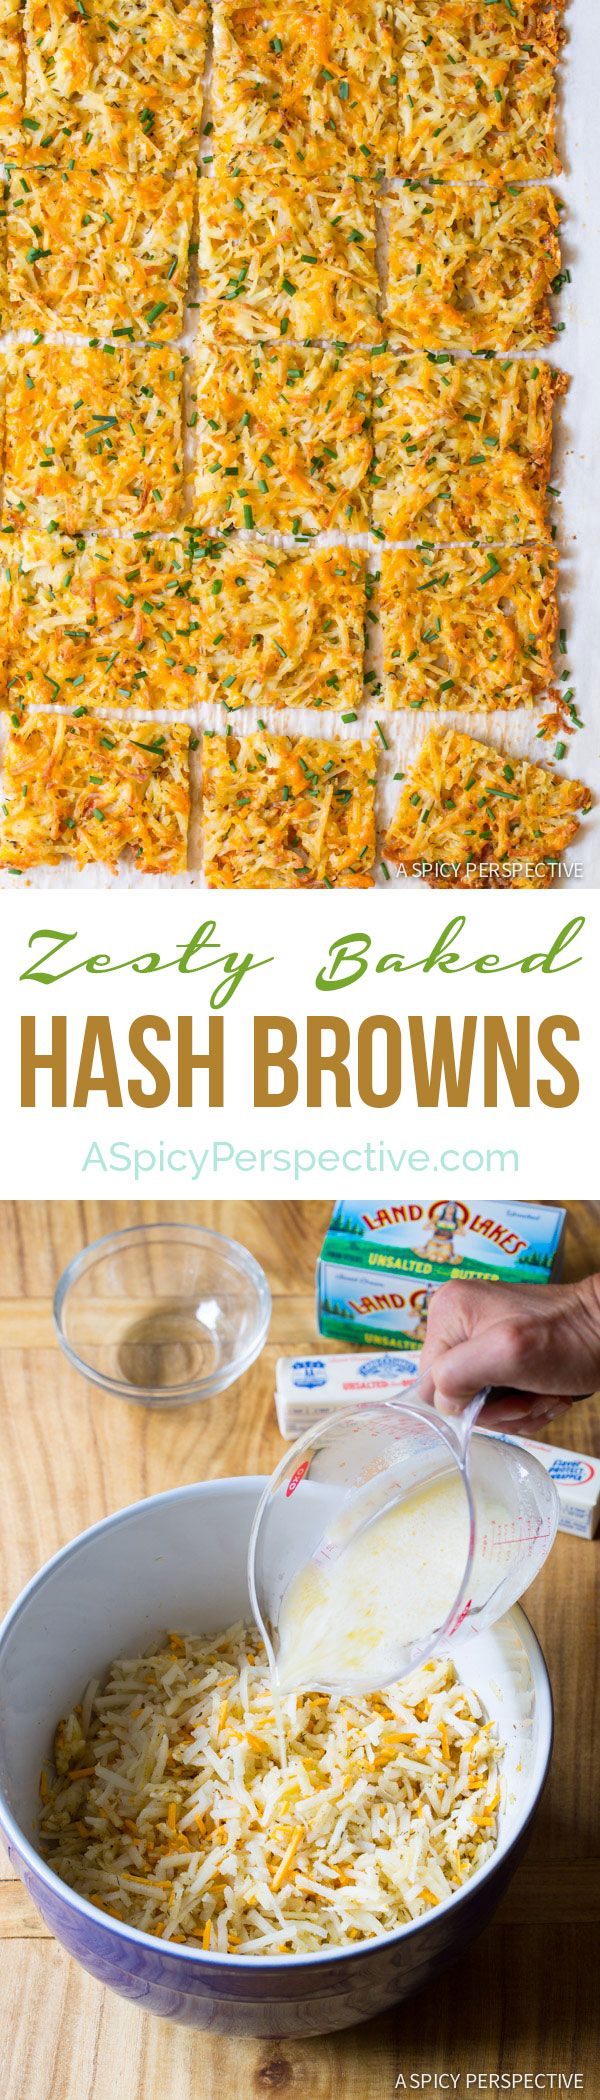 Easy Crispy and Zesty Baked Hash Brown Recipe on ASpicyPerspective.com #breakfast #potatoes